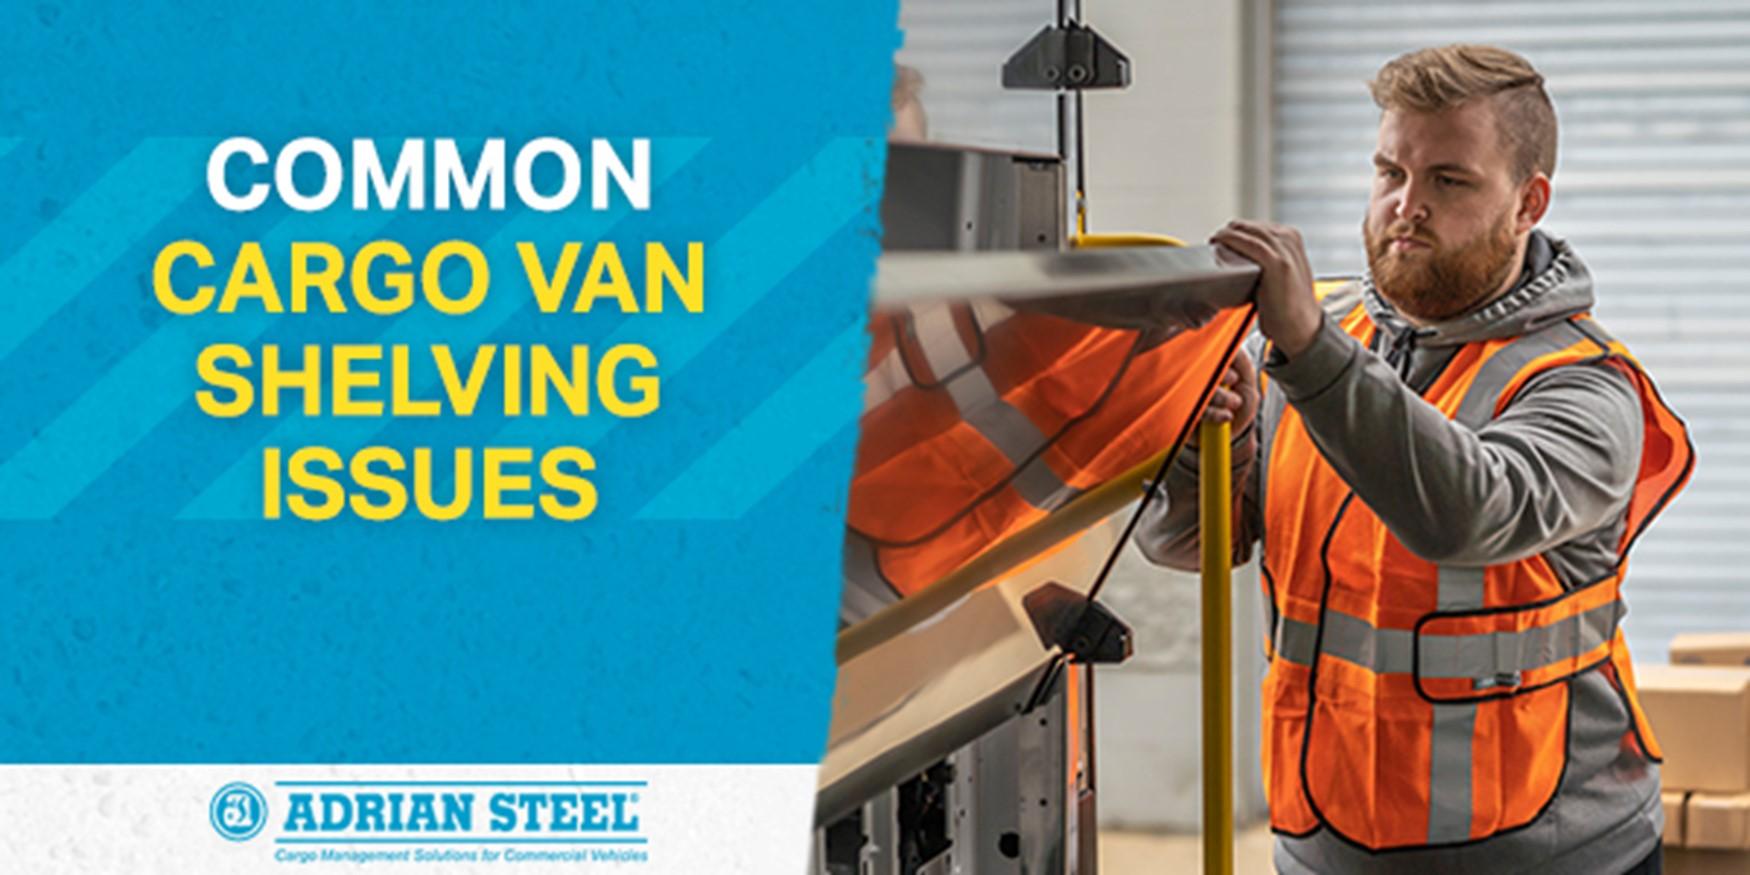 common cargo van shelving issues